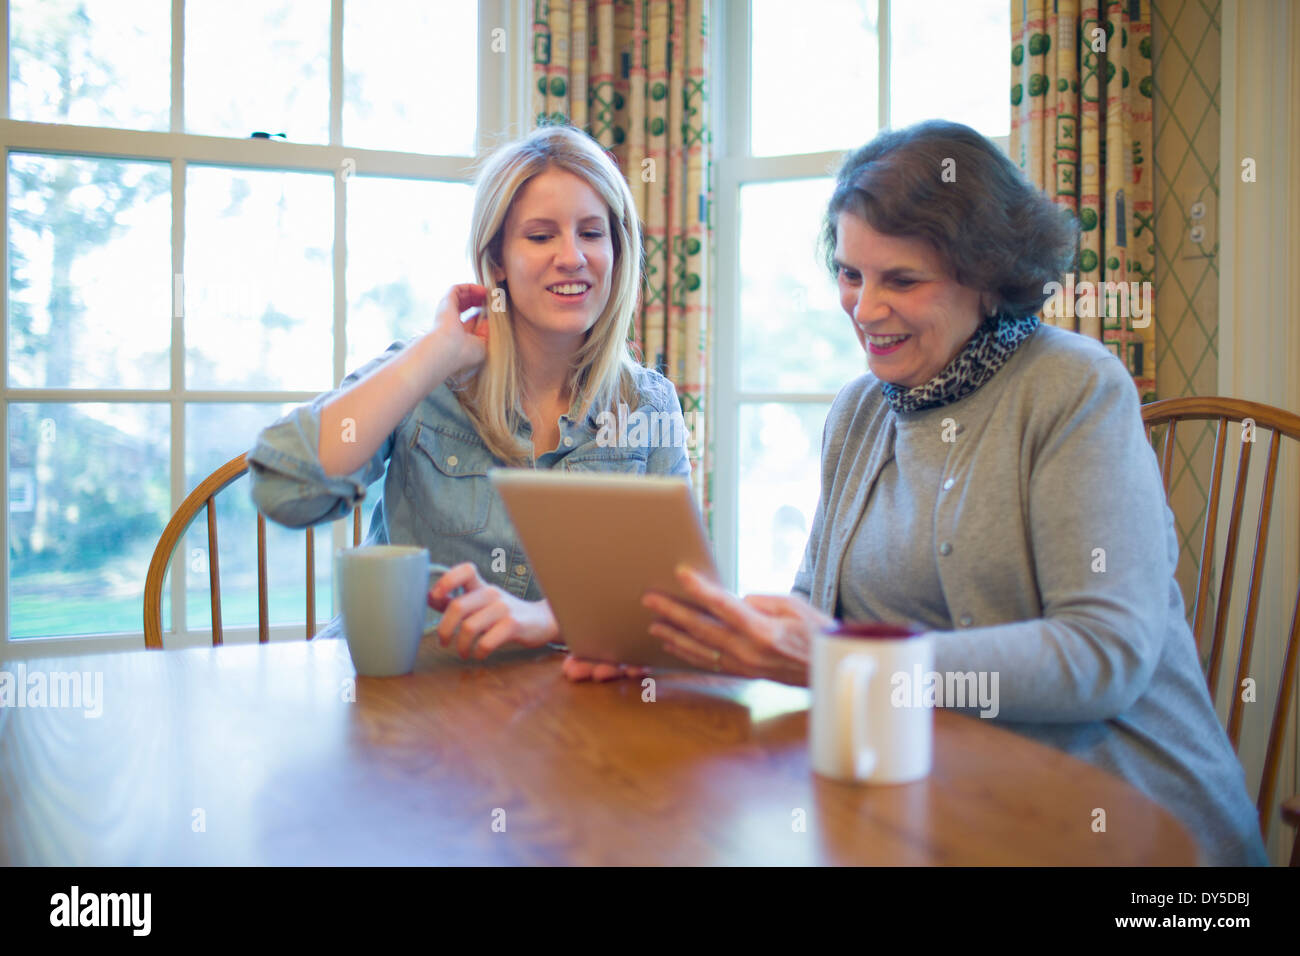 Ältere Frau und Enkelin Blick auf digital-Tablette Stockbild